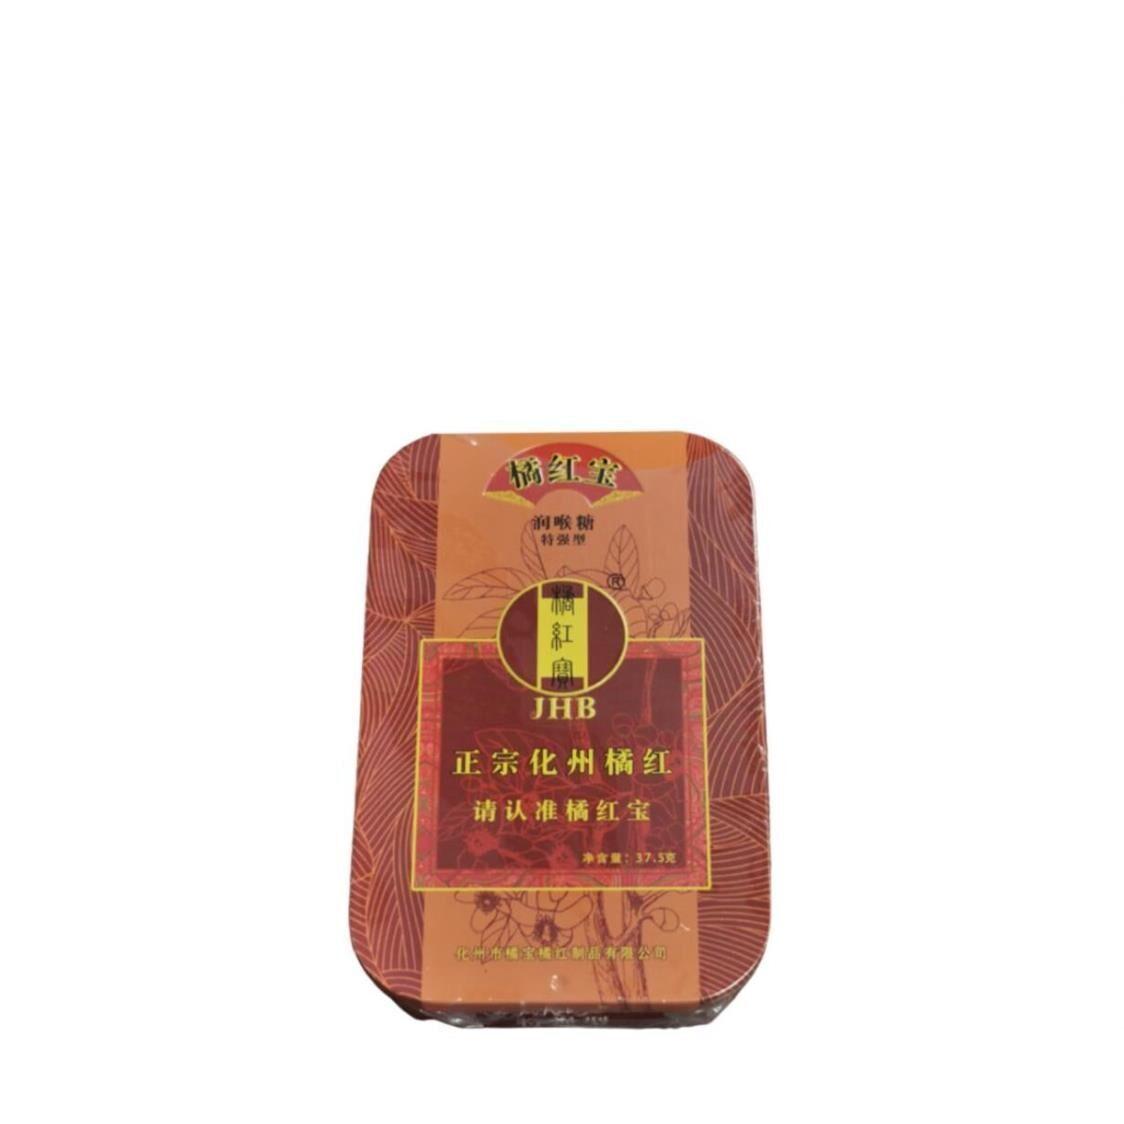 Winlykah TCM Jhb Refreshing Herbal Candy